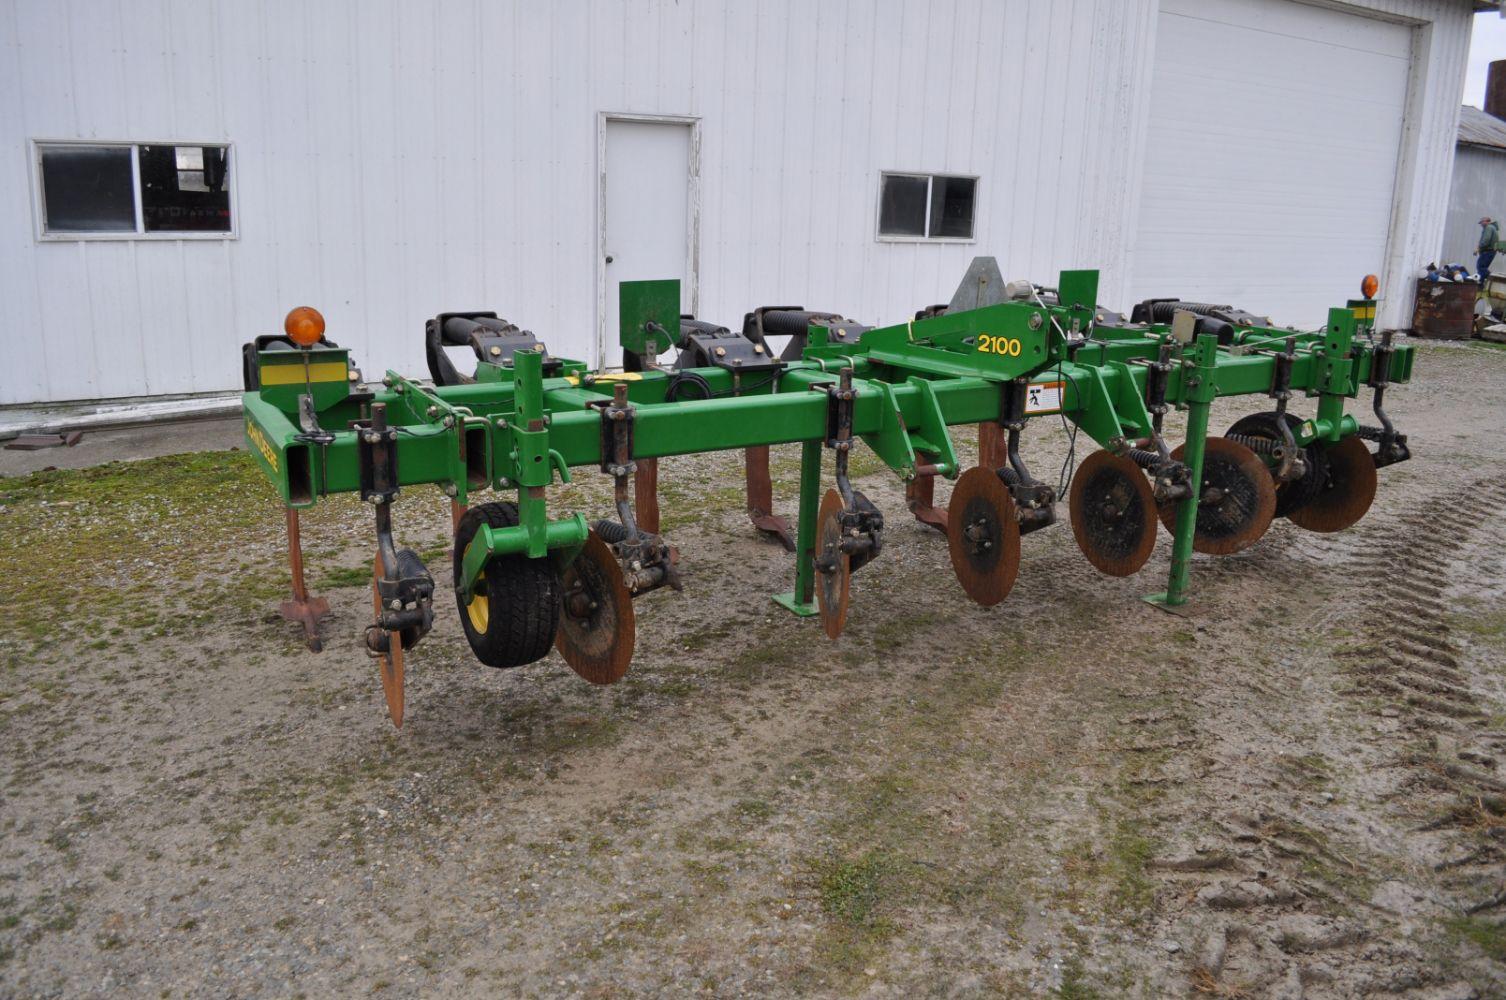 Walker Farm Equipment Auction